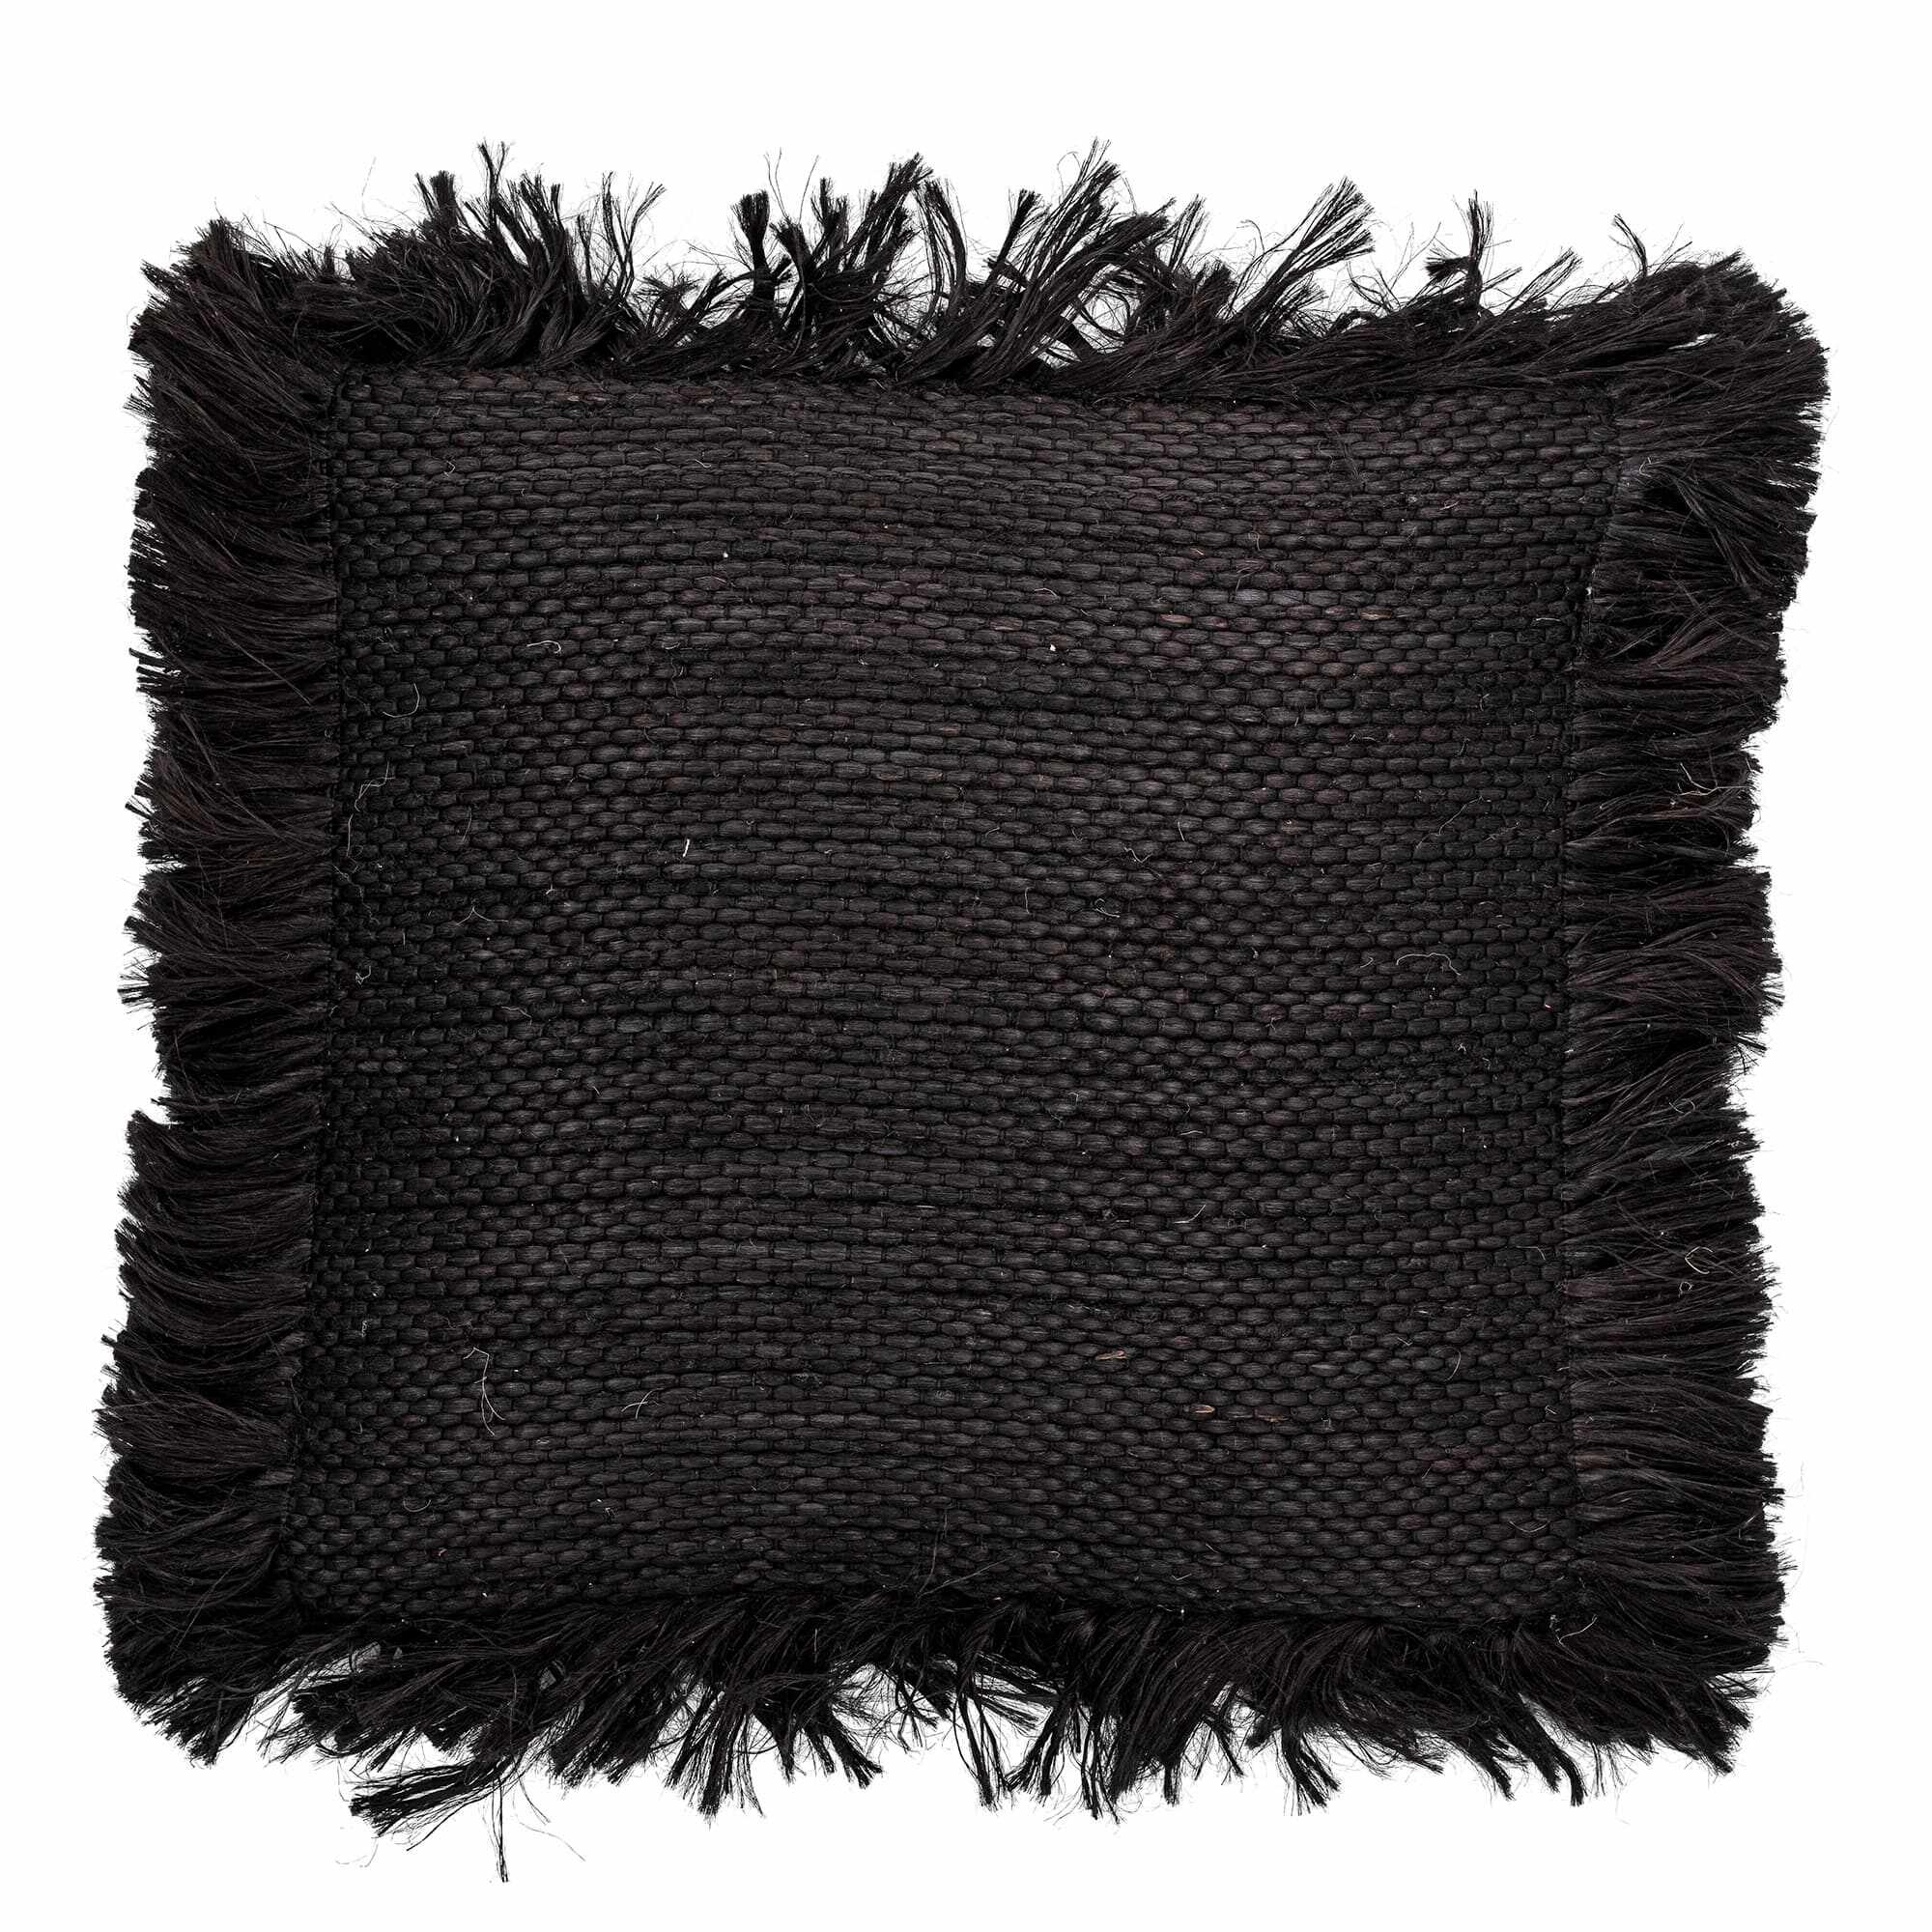 Perna decorativa cu husa detasabila, Gvidas Negru, 50 x 50 cm la pret 237 lei